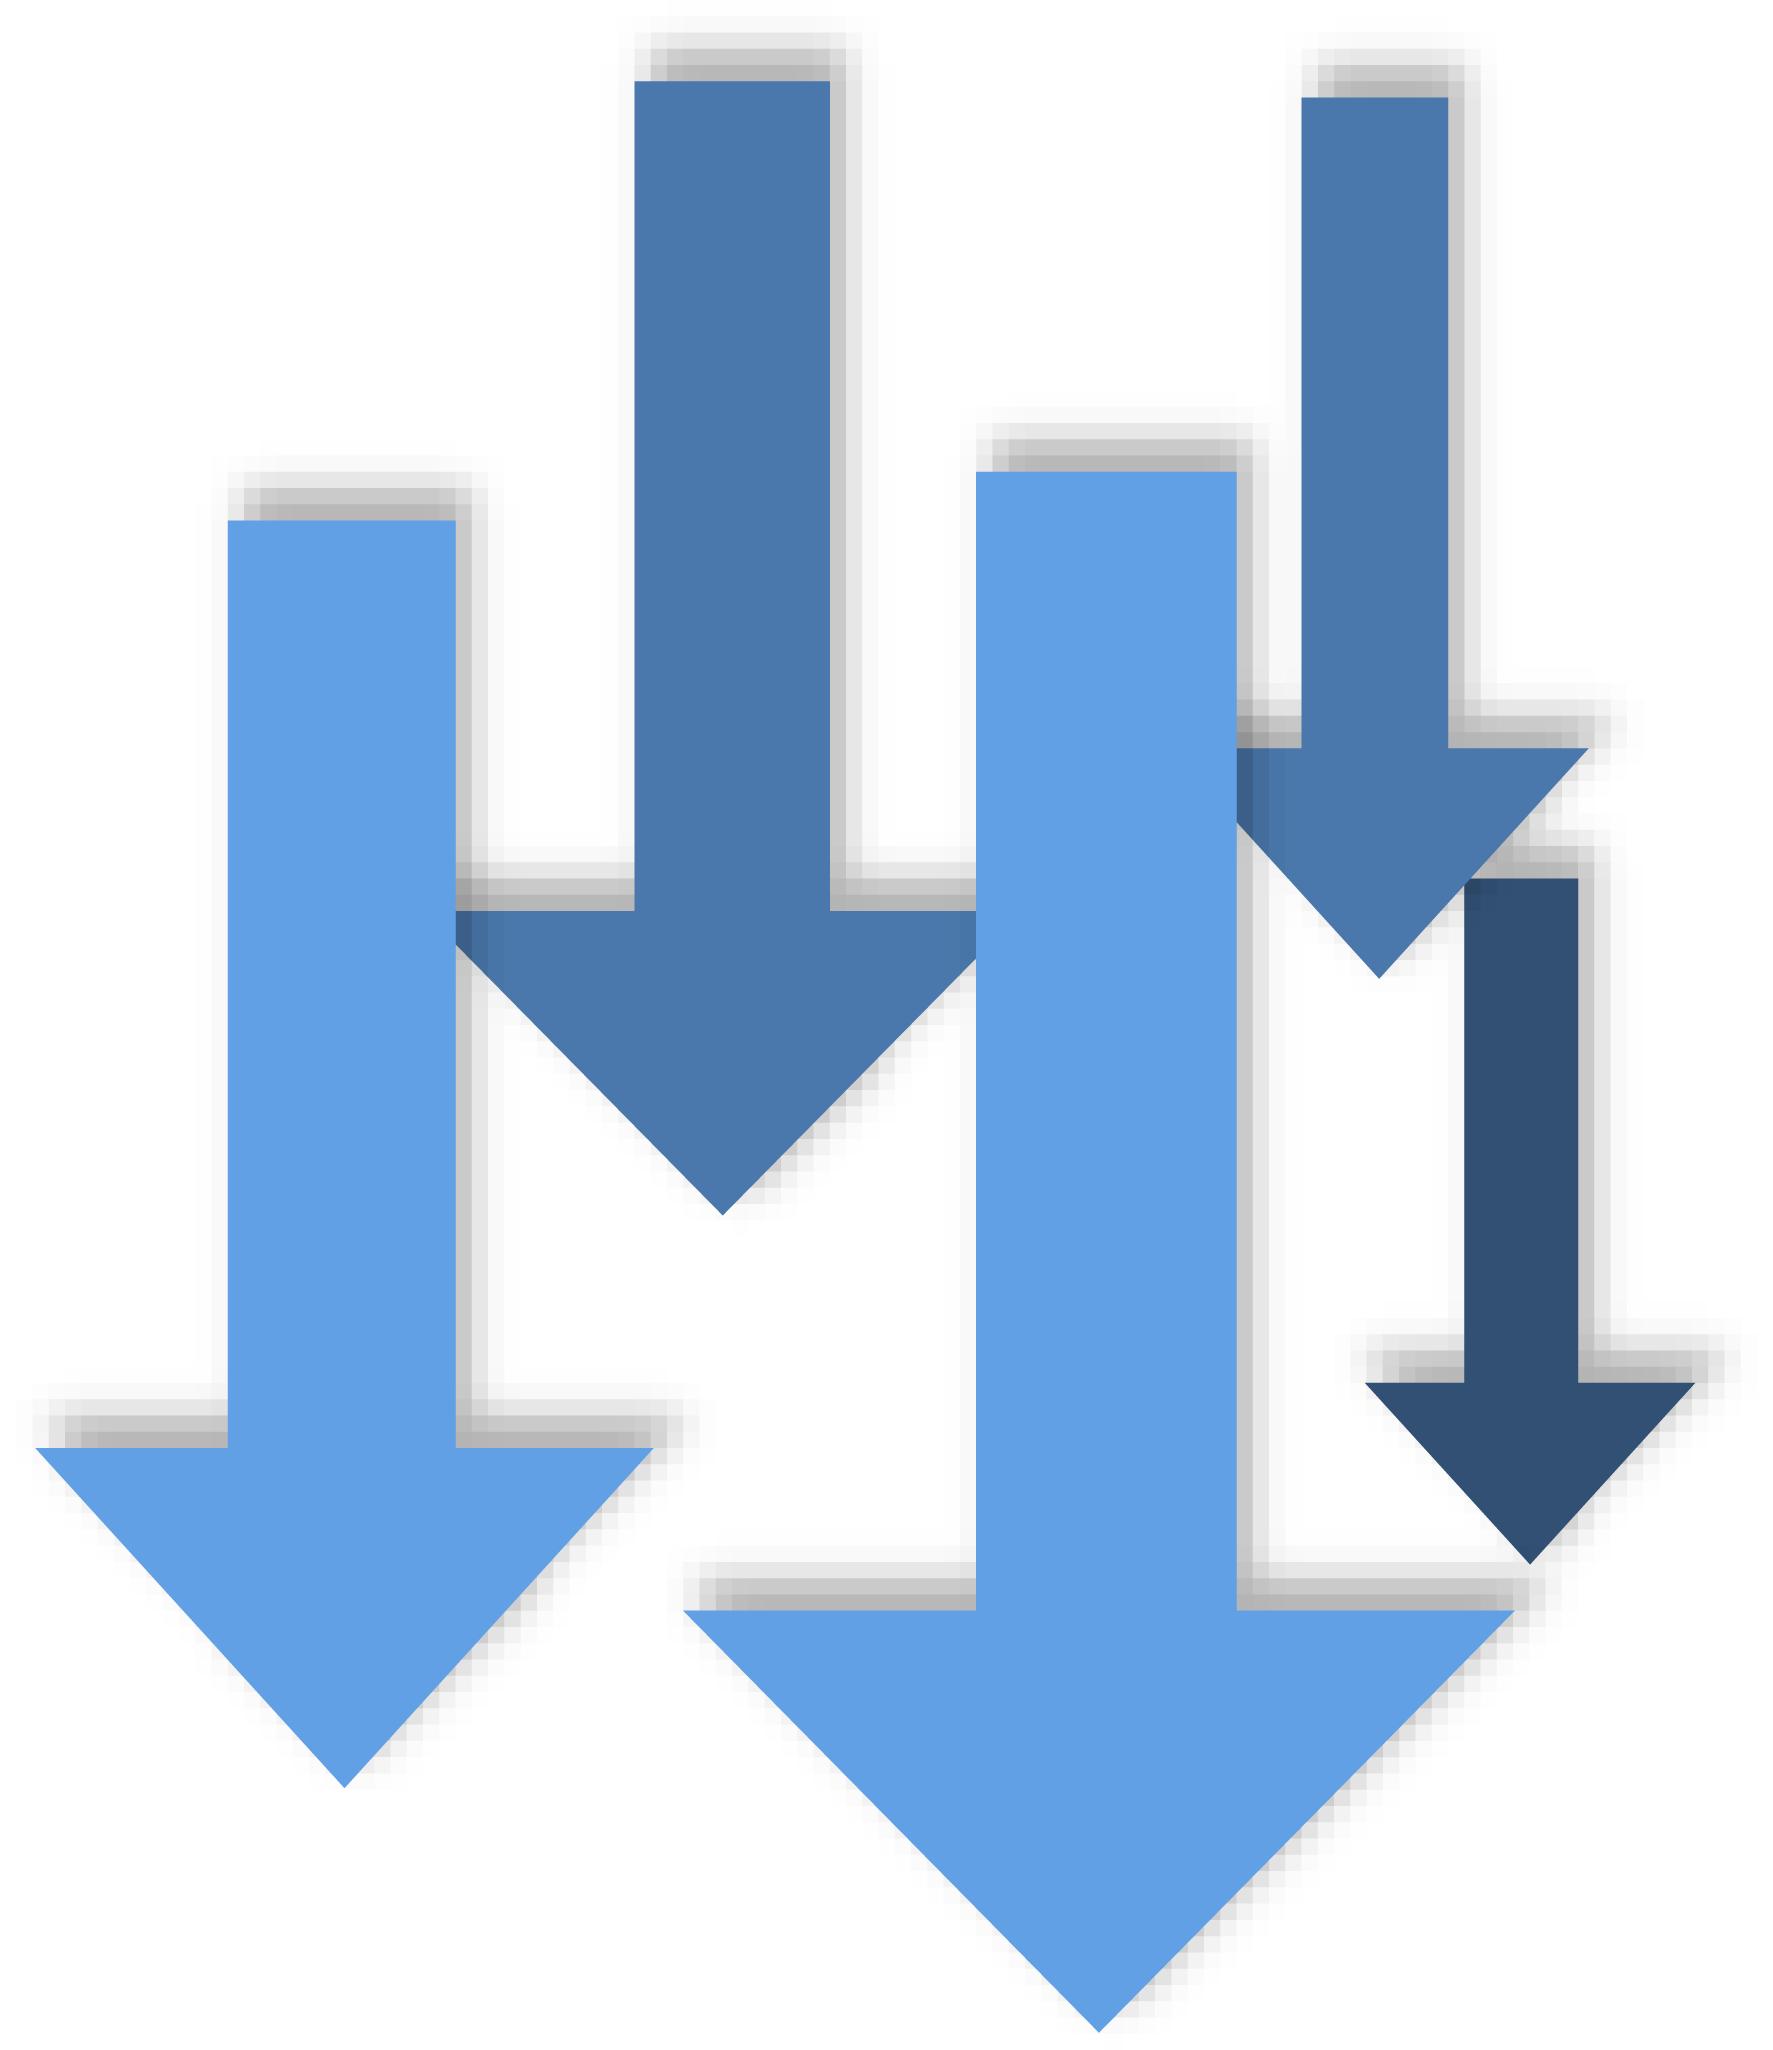 Downster.net gibt 50% Rabatt – ul.to, ddl.to, filefactory.com & filer.net ab 1€ für 7 Tage